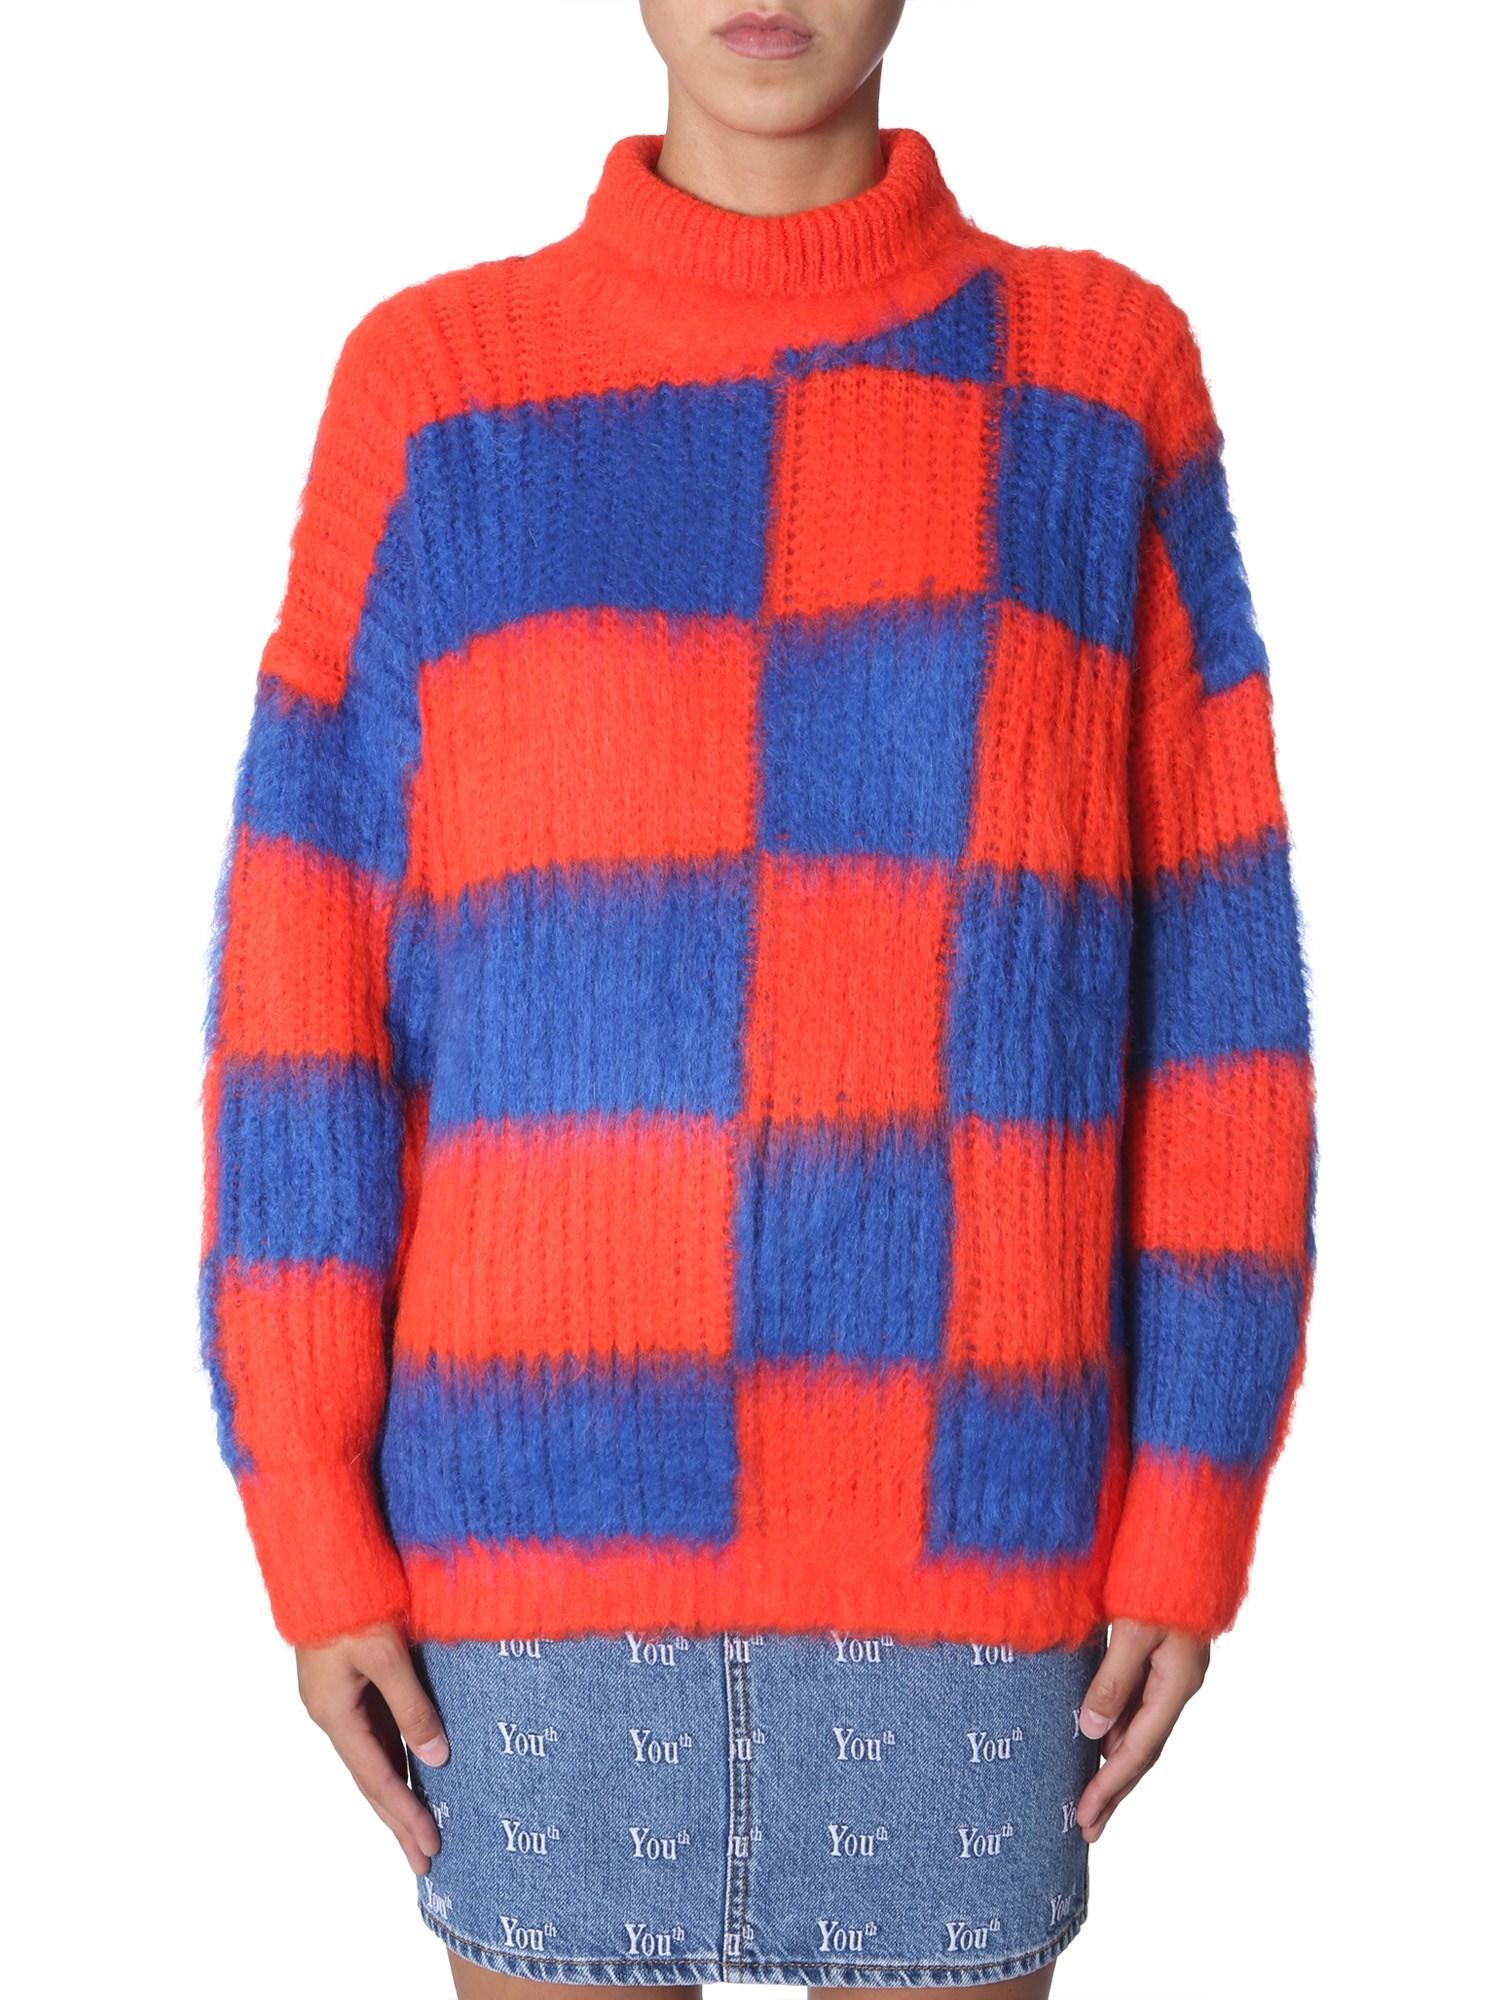 Msgm crew neck sweater - msgm - Modalova